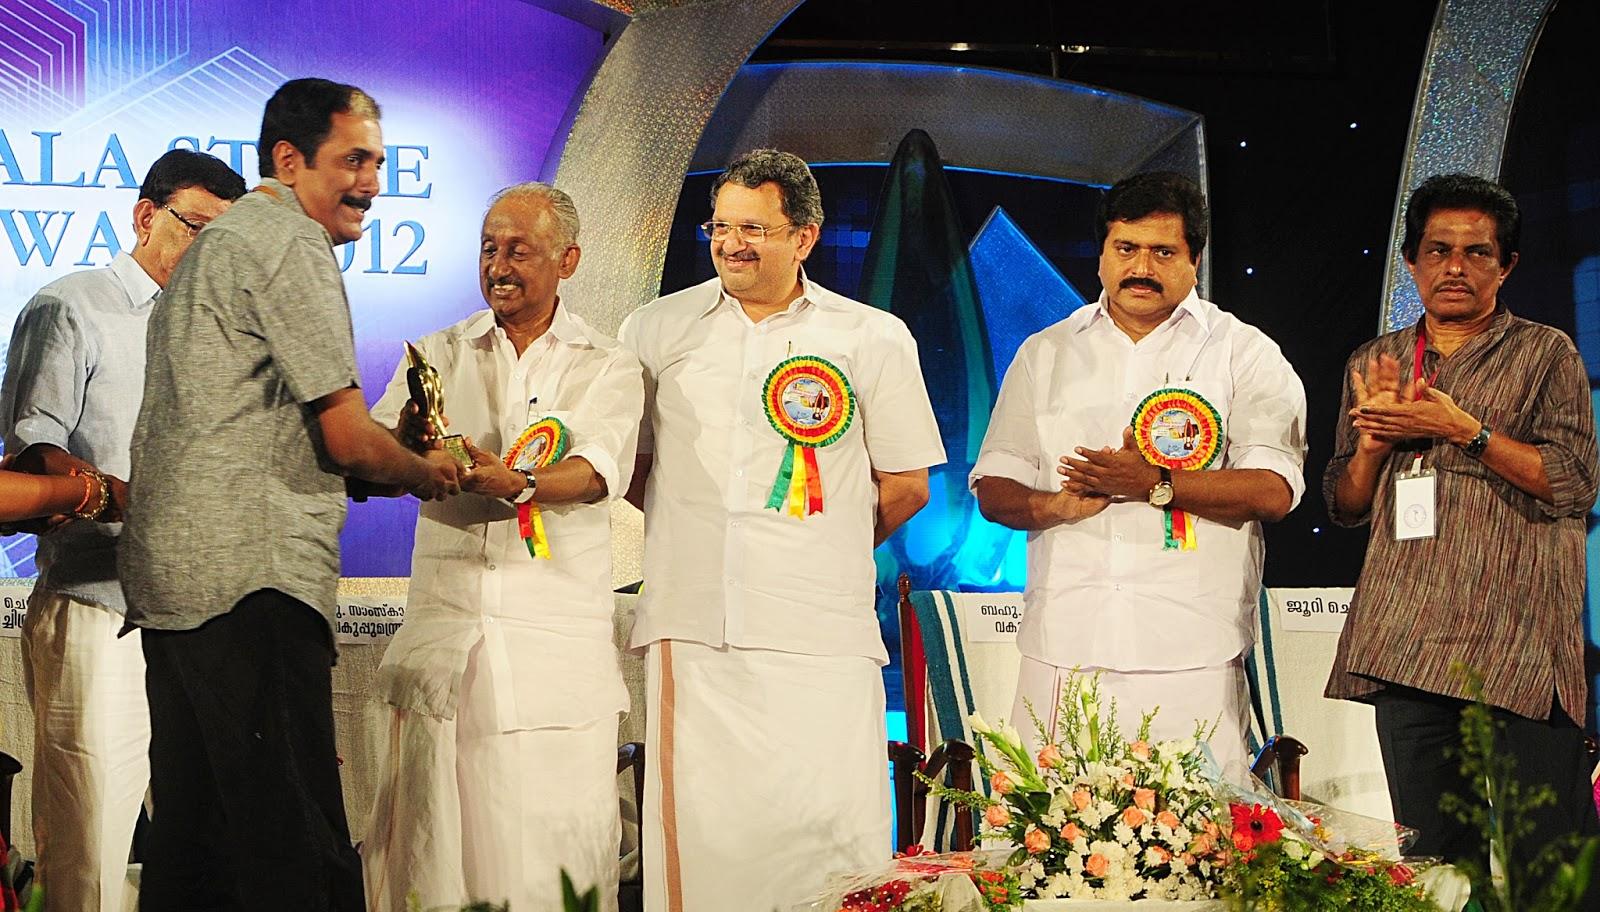 State TV Award 2012